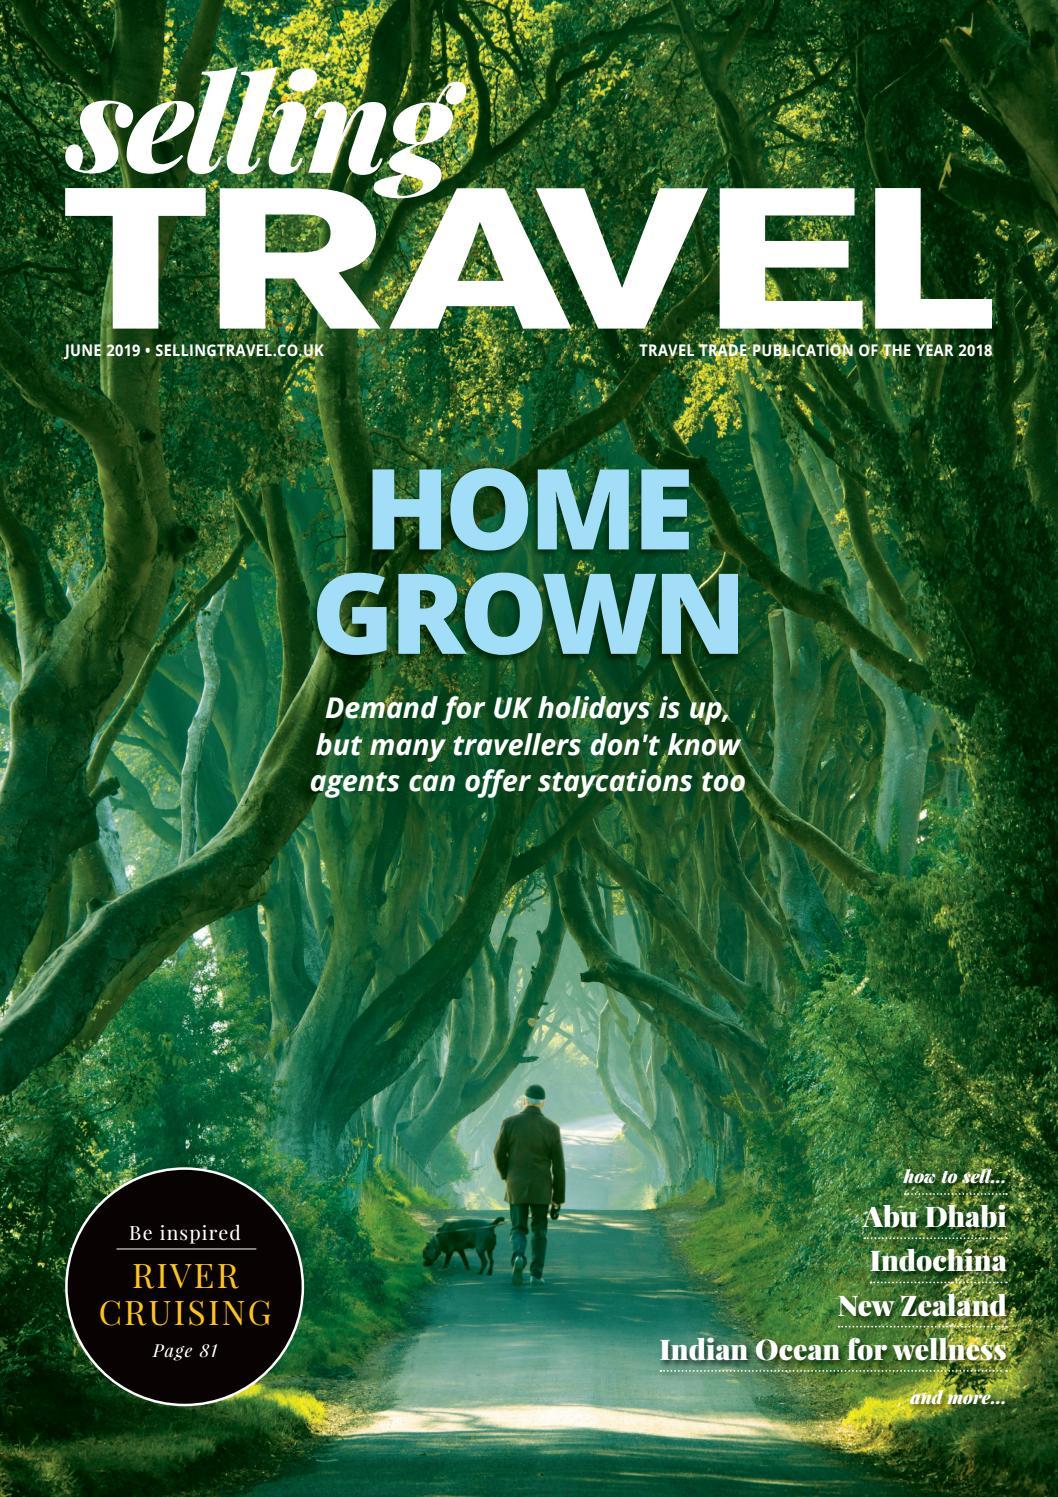 selling travel june 2019 by bmi publishing ltd issuu  nane aceeasi jungle girlshare ro.php #4